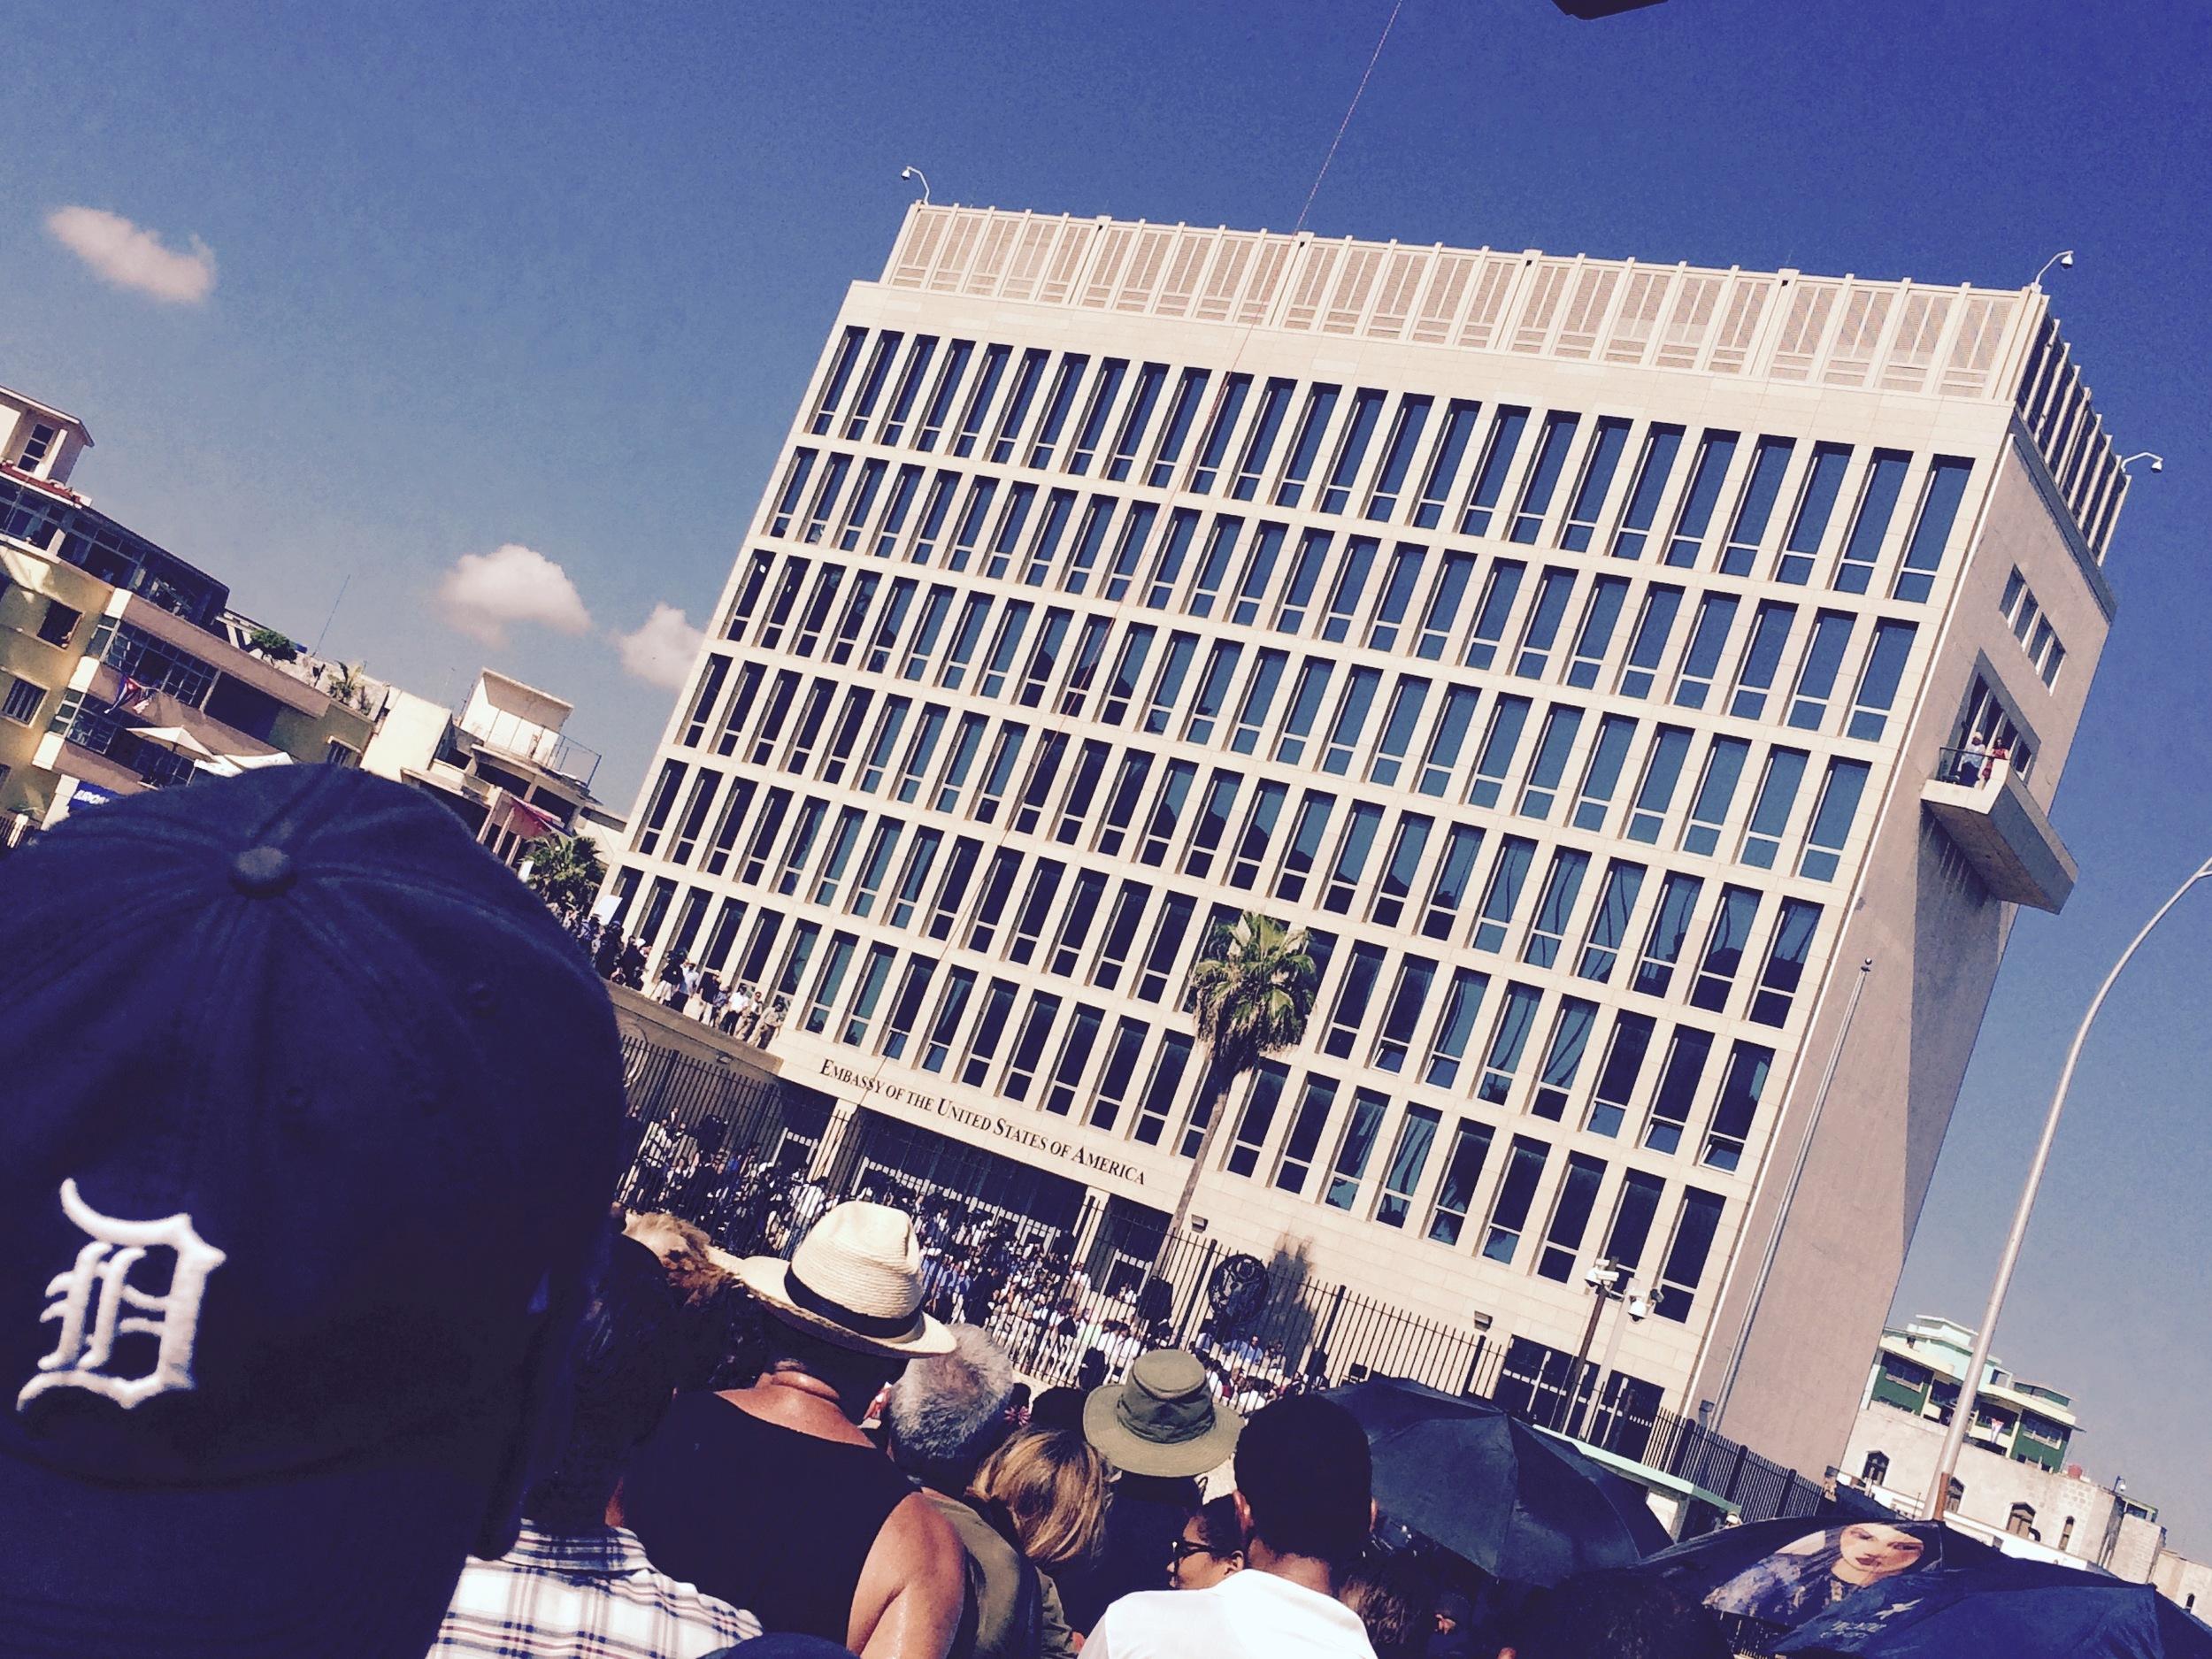 The opening of the U.S embassy, Havana